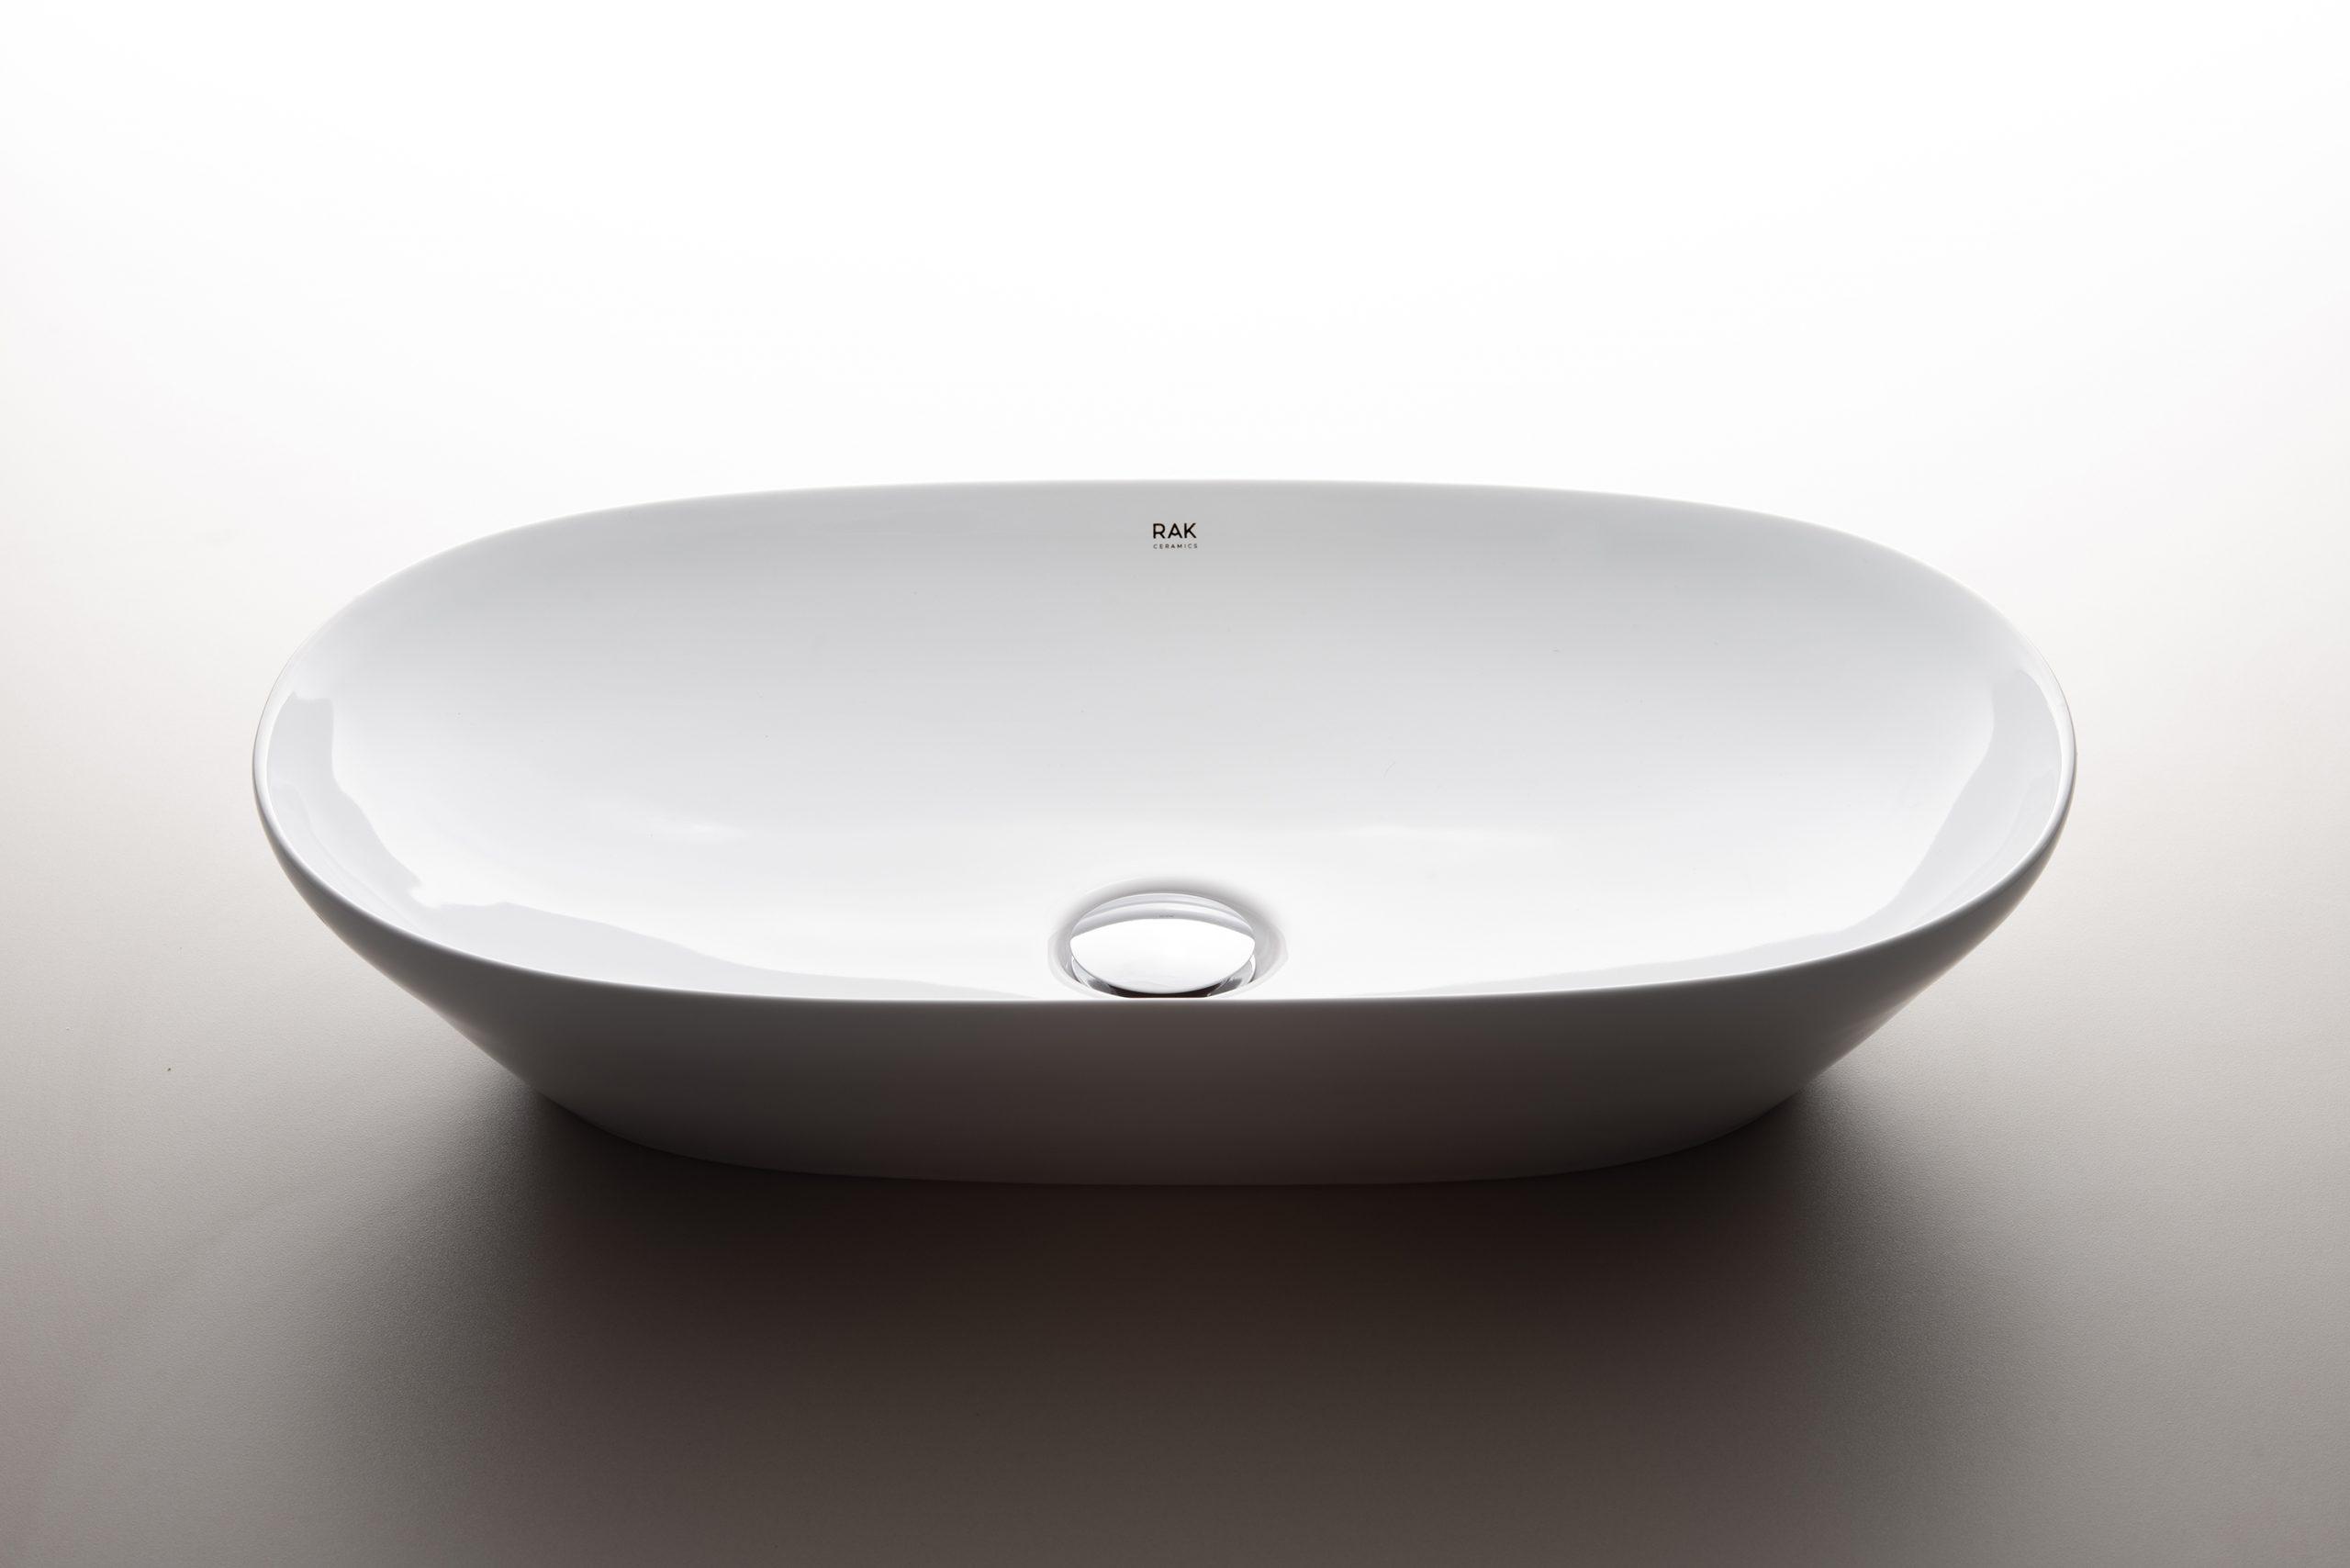 Oval washbasin Variant washbasins designed by Debiasi Sandri for RAK Ceramics